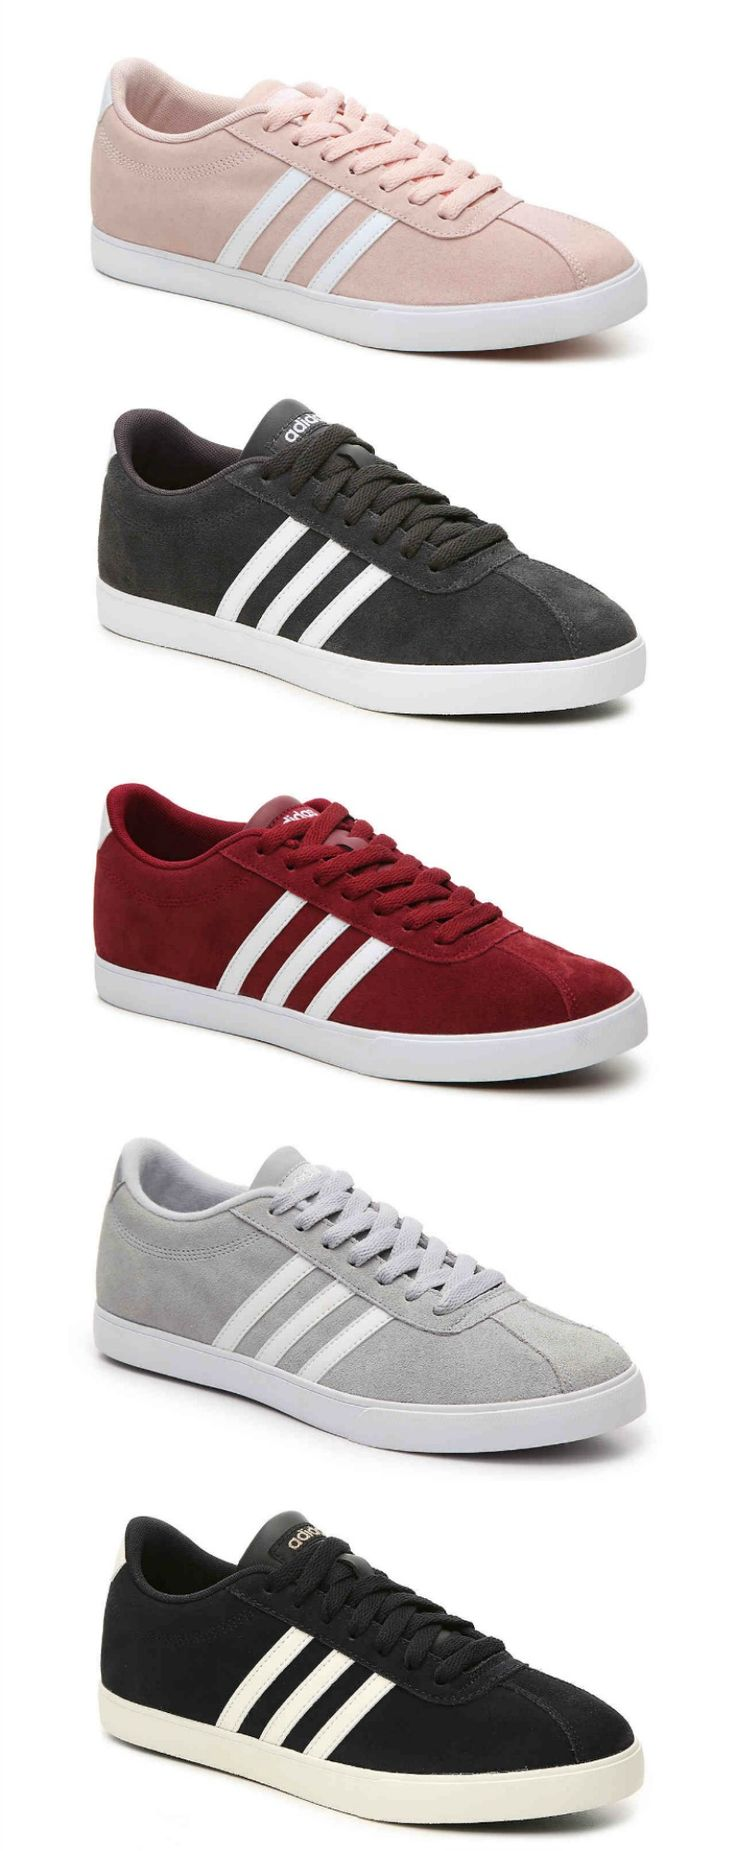 #mindymaesmarket #dreamcloset Adidas Neo